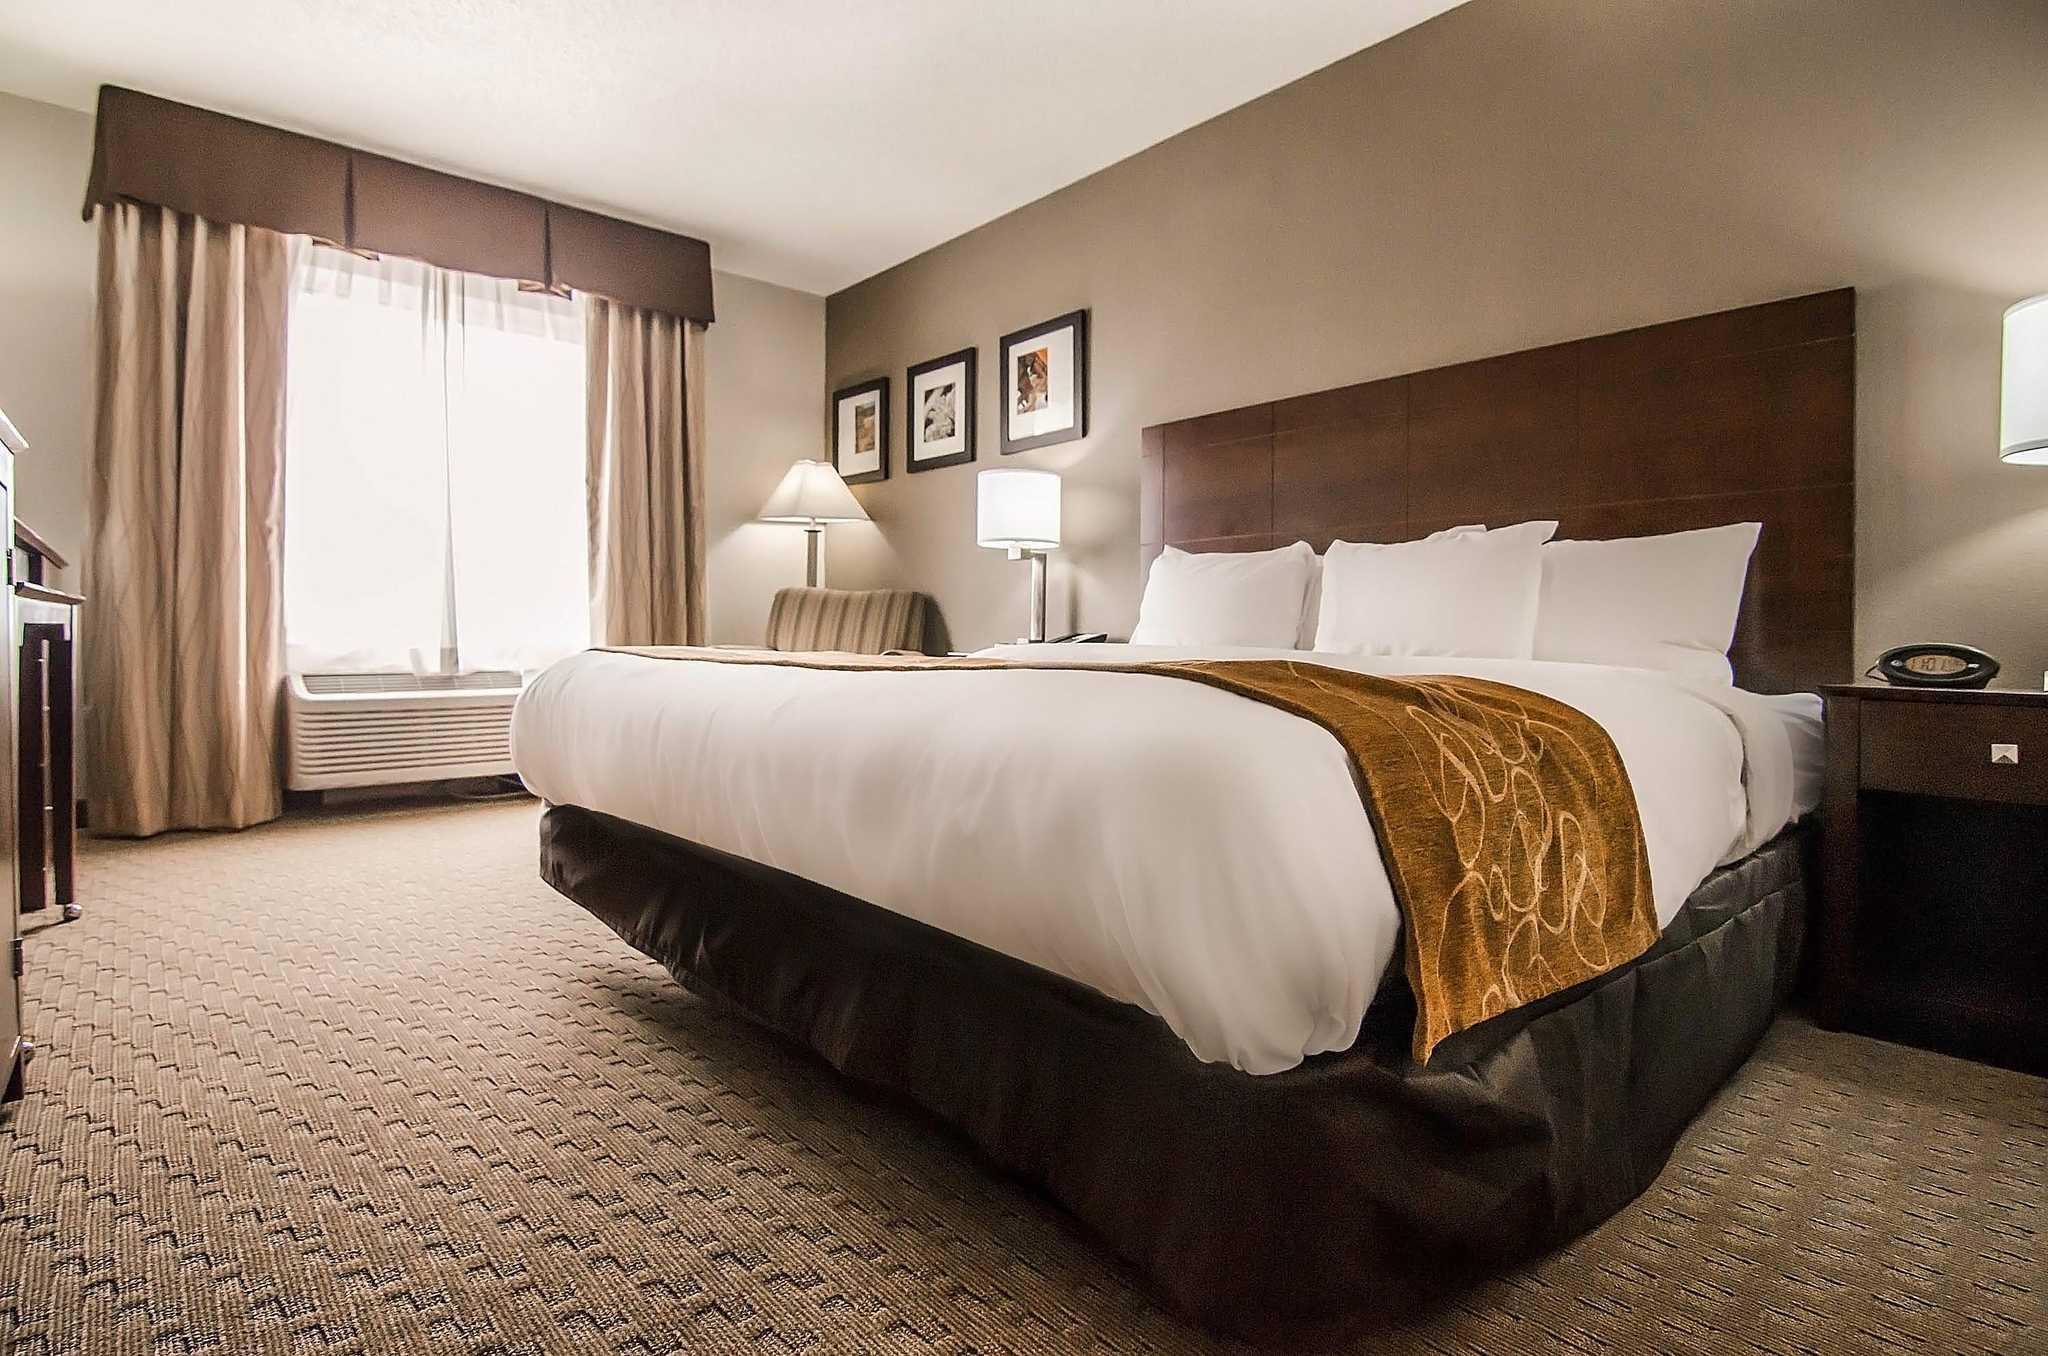 Room Hotel Suites Near St Joseph Mo